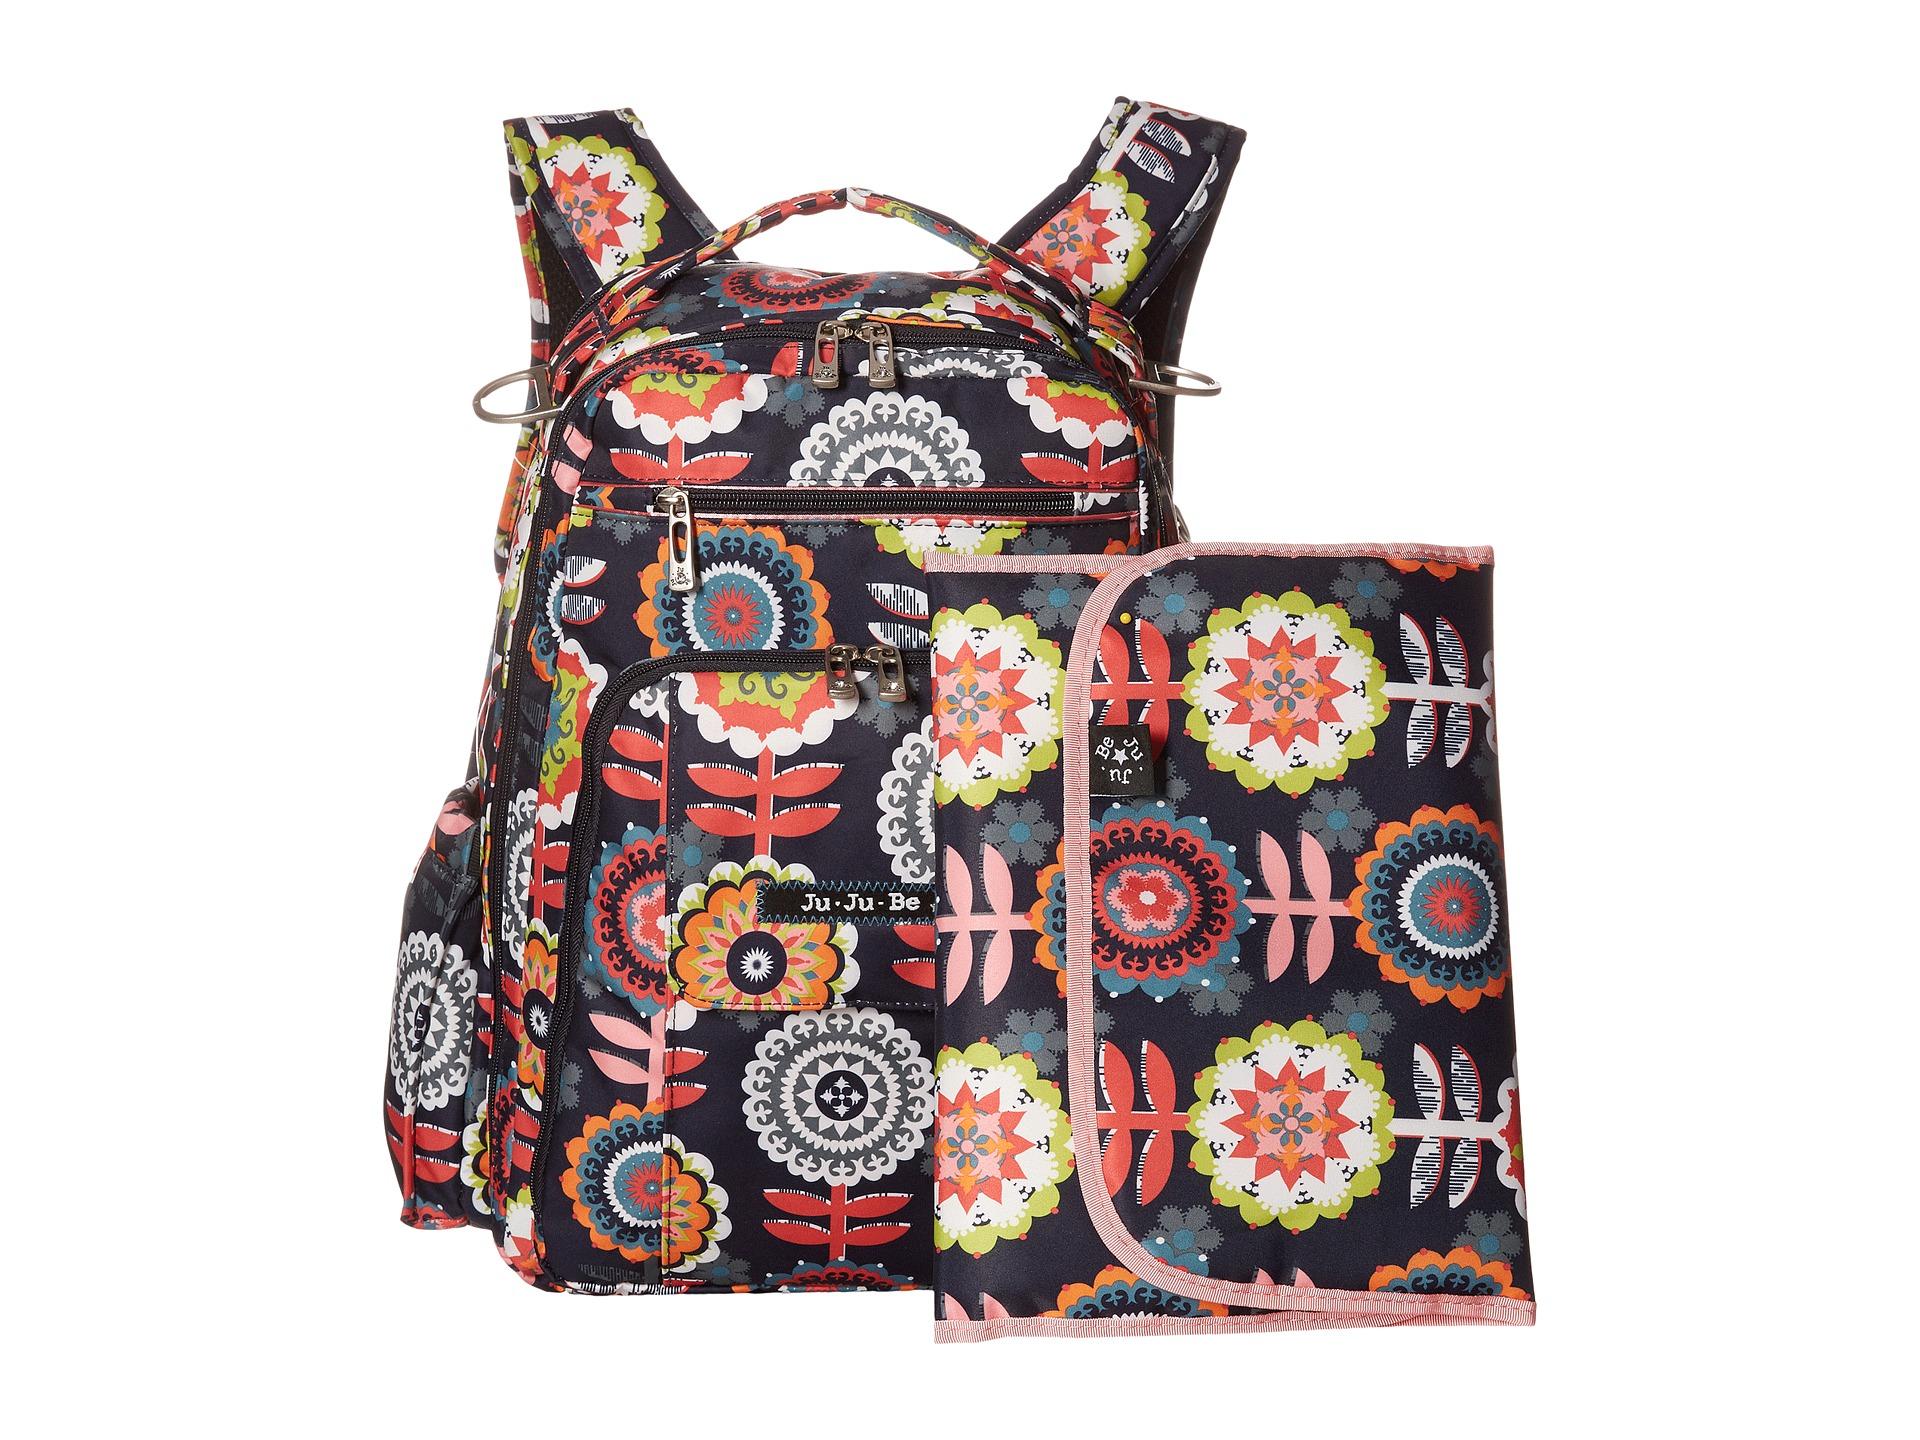 ju ju be be right back backpack diaper bag platinum petals free shipping both ways. Black Bedroom Furniture Sets. Home Design Ideas